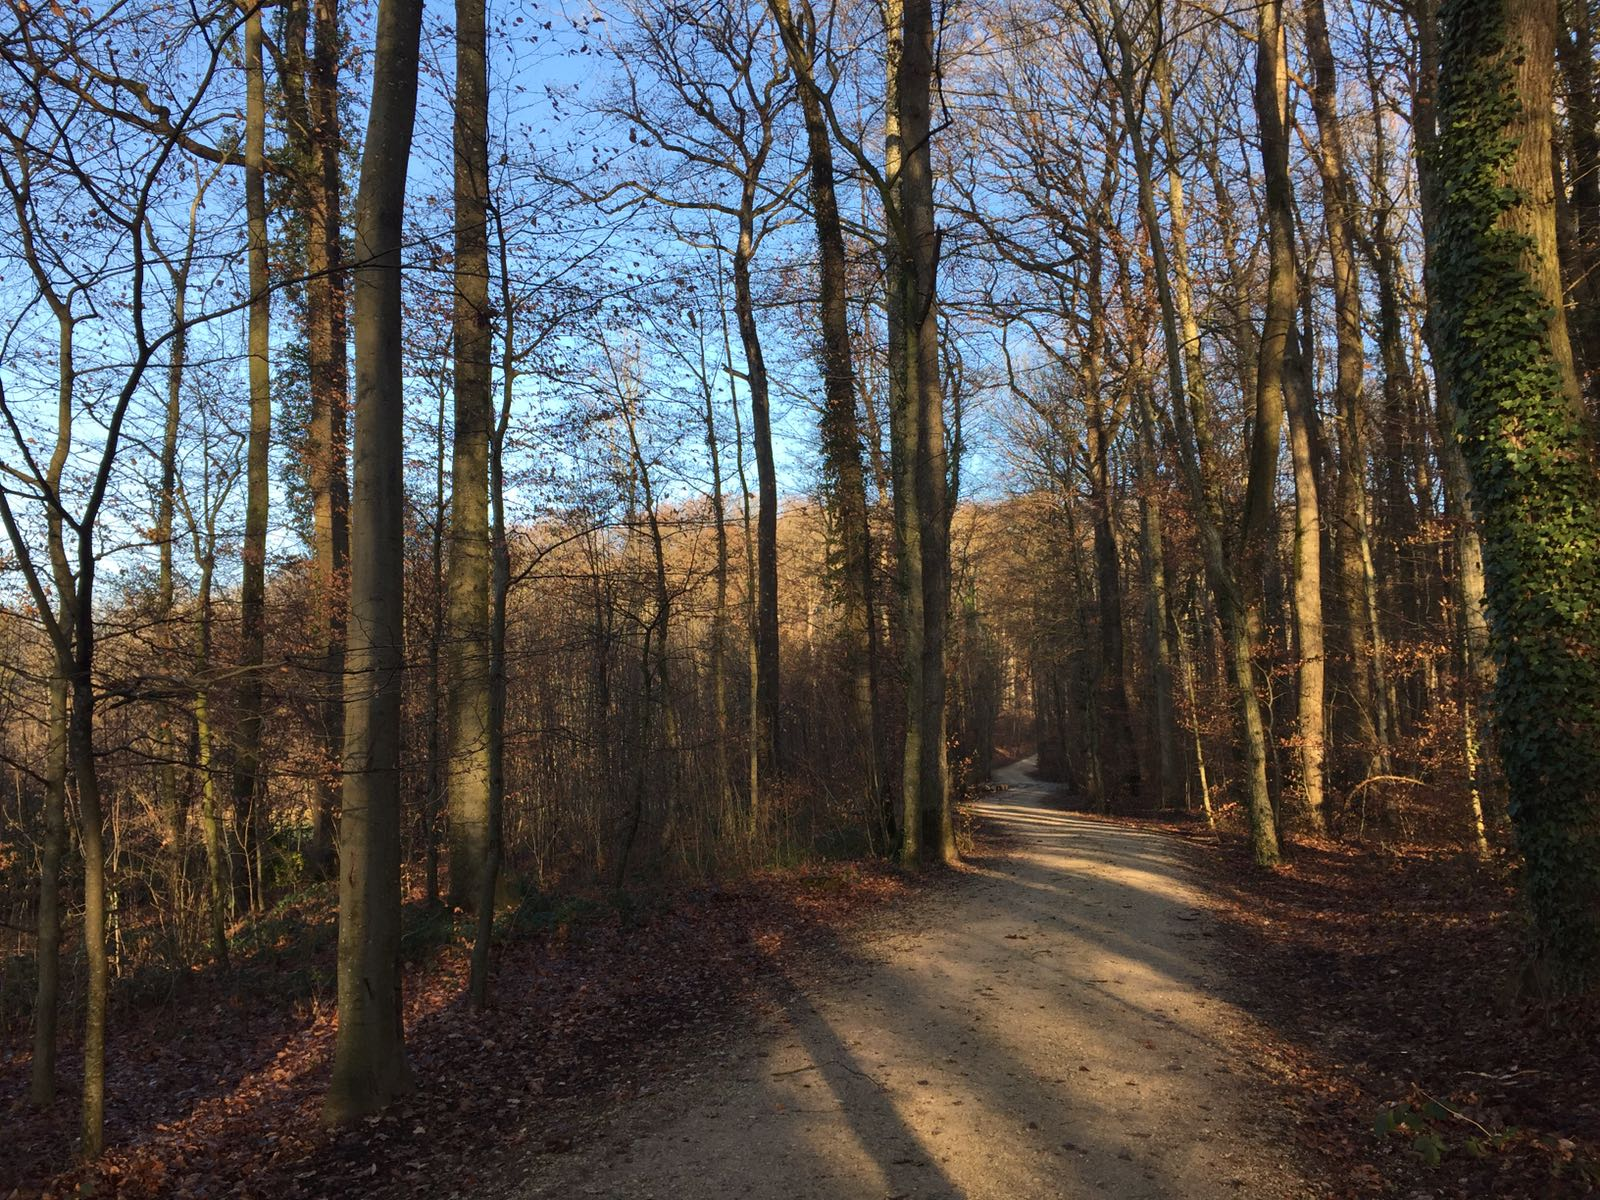 The Pathways of Robin Hood